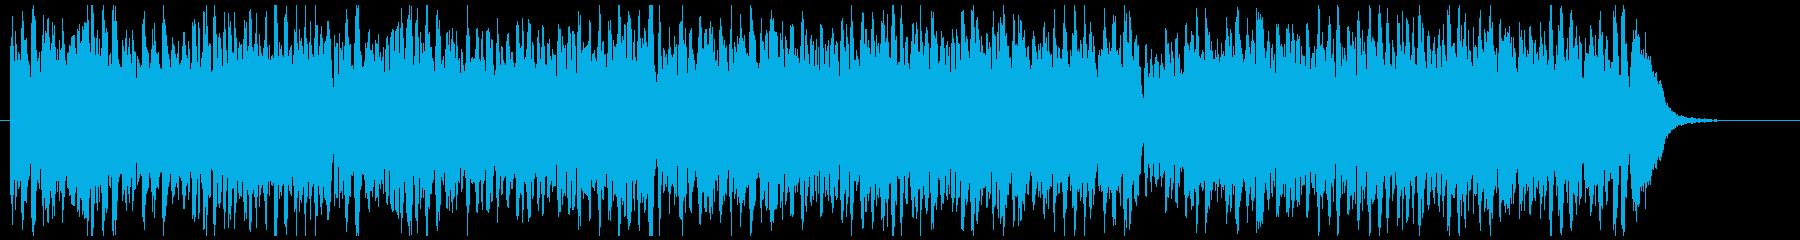 BWV1067/7『バディネリ』バッハの再生済みの波形